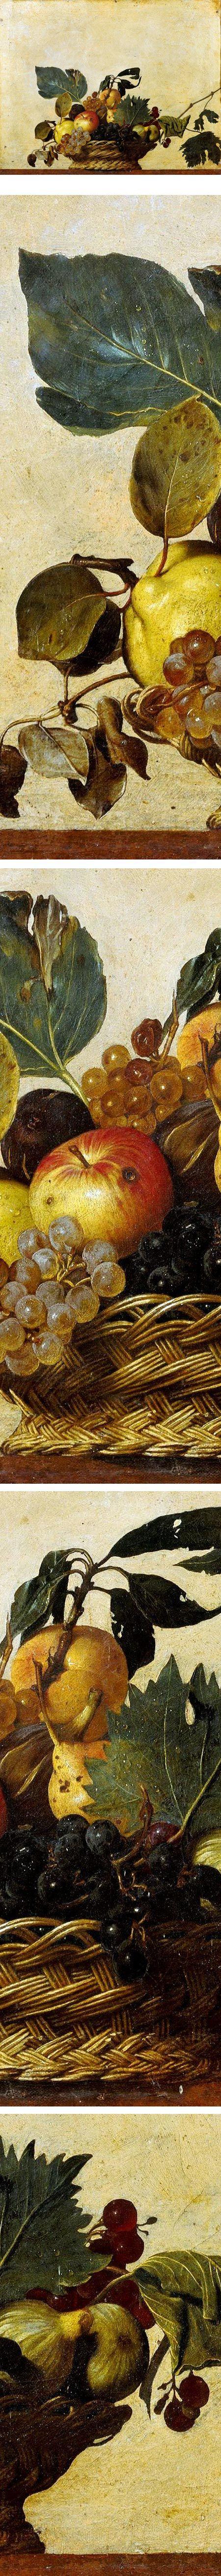 Basket of Fruit, Caravaggio (Michelangelo Merisi da Caravaggio) ... vibration of his colours are ... litherally edible,if I may... :) Sensational !